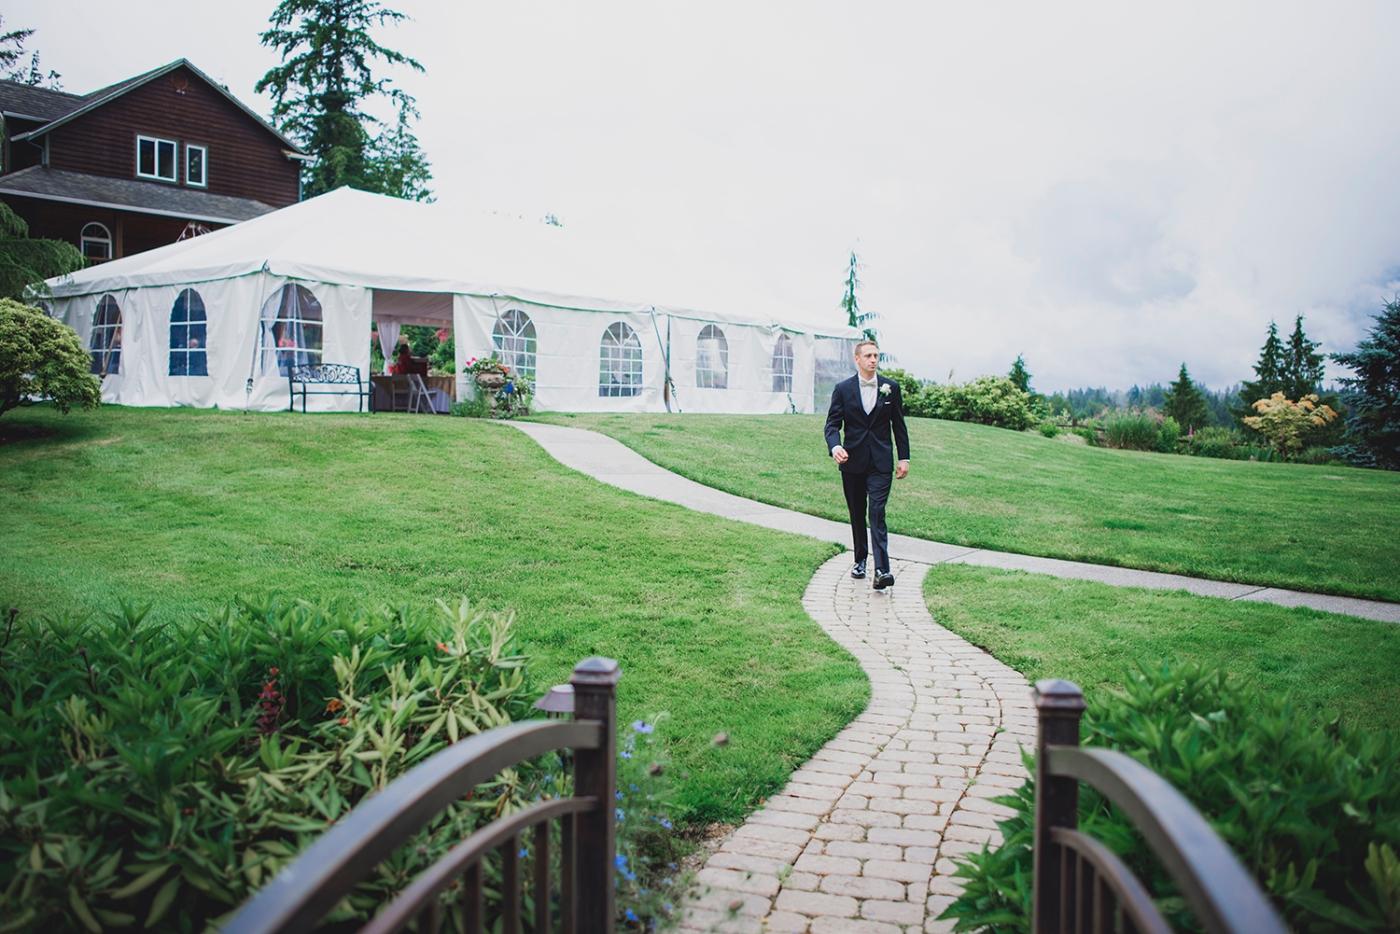 Jane_Speleers_2016_arriving to reception _Wedding_Wild_Rose_Estates_Venue_DSC_9810